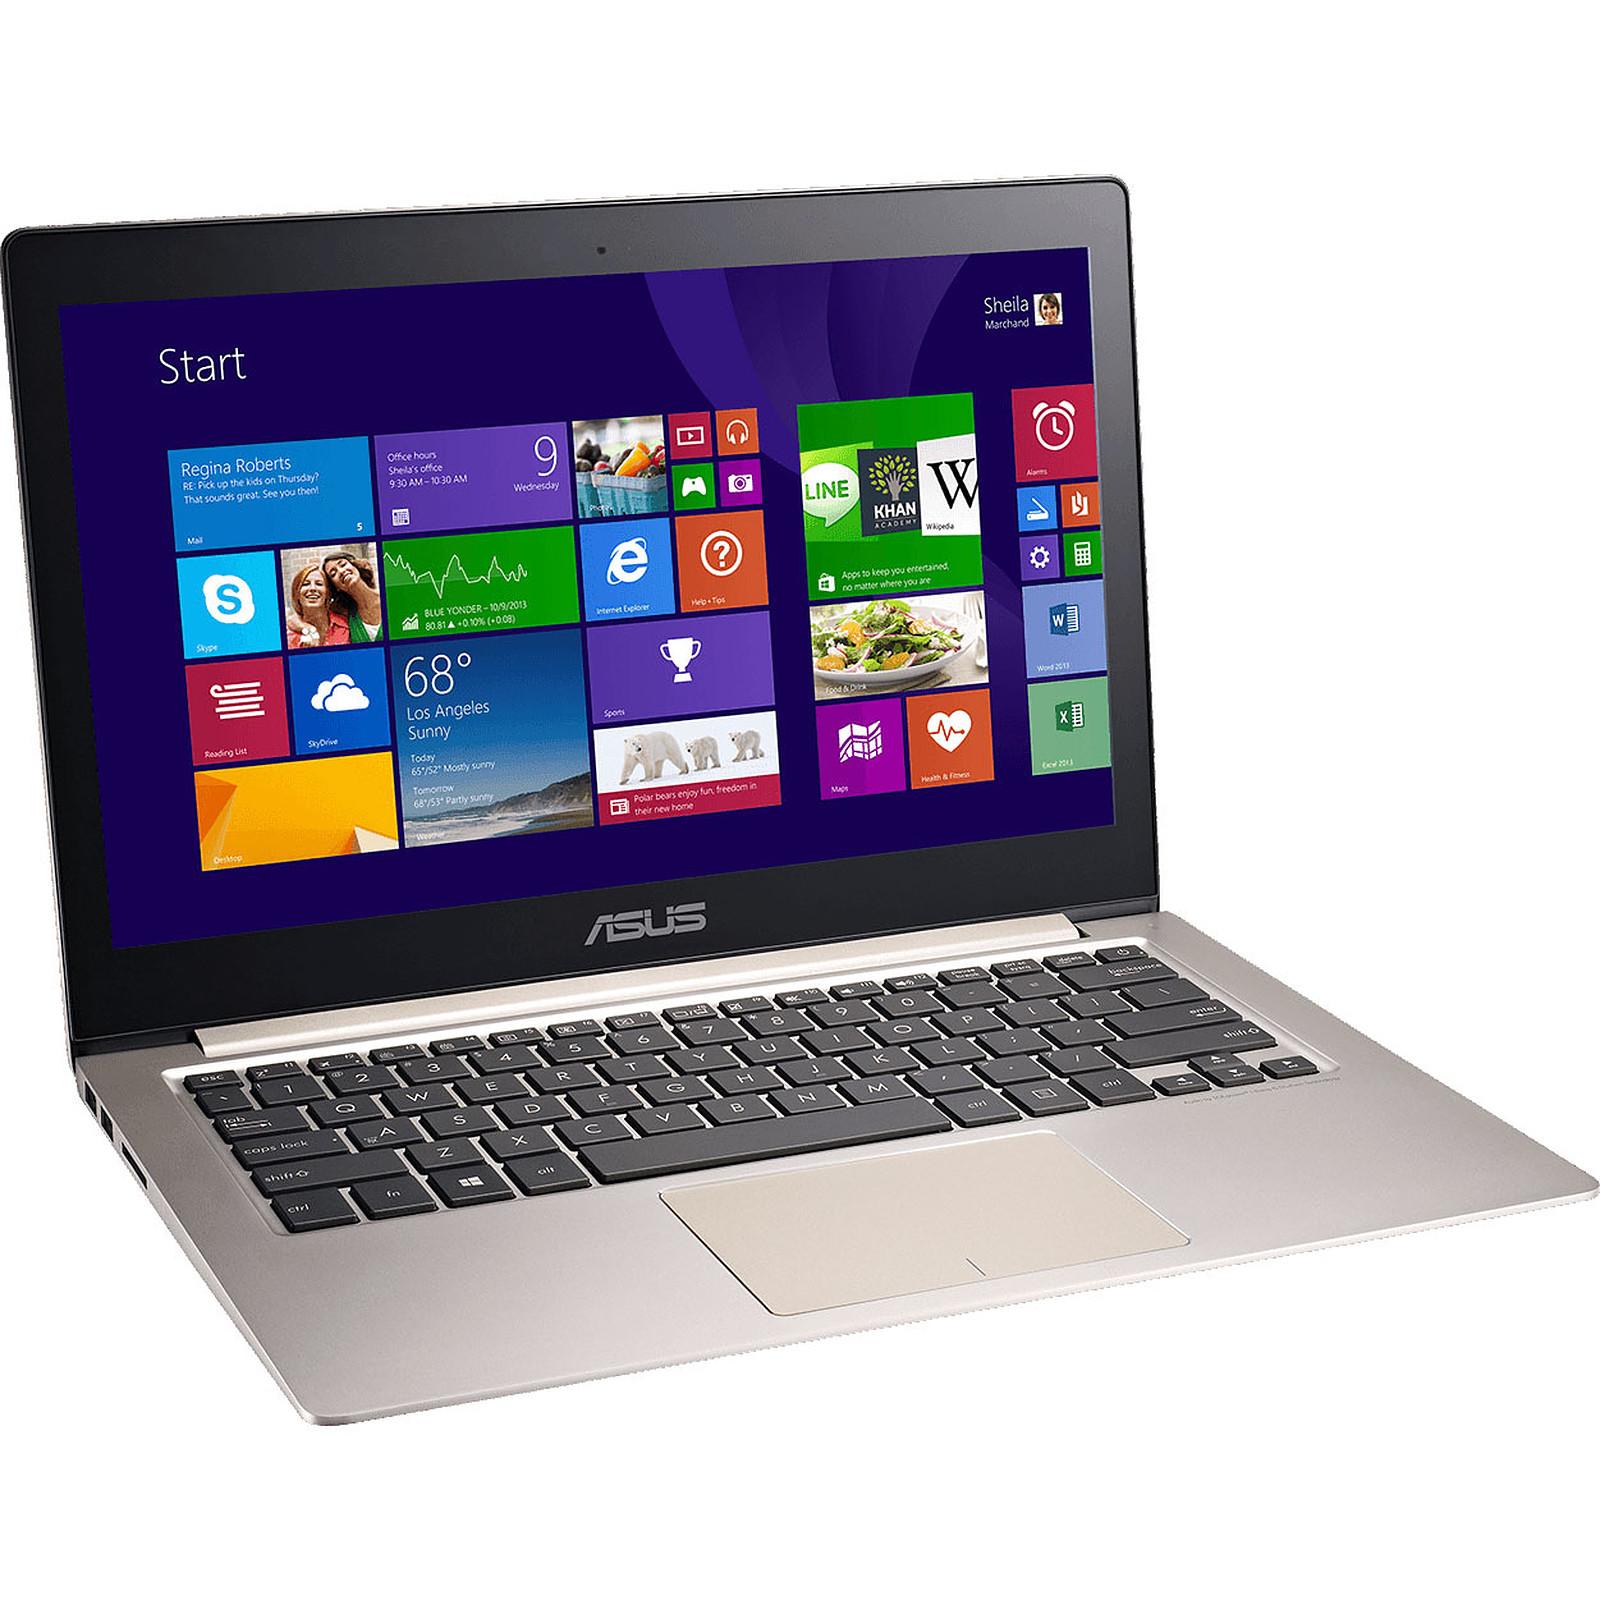 ASUS Zenbook UX303LA-R40025G